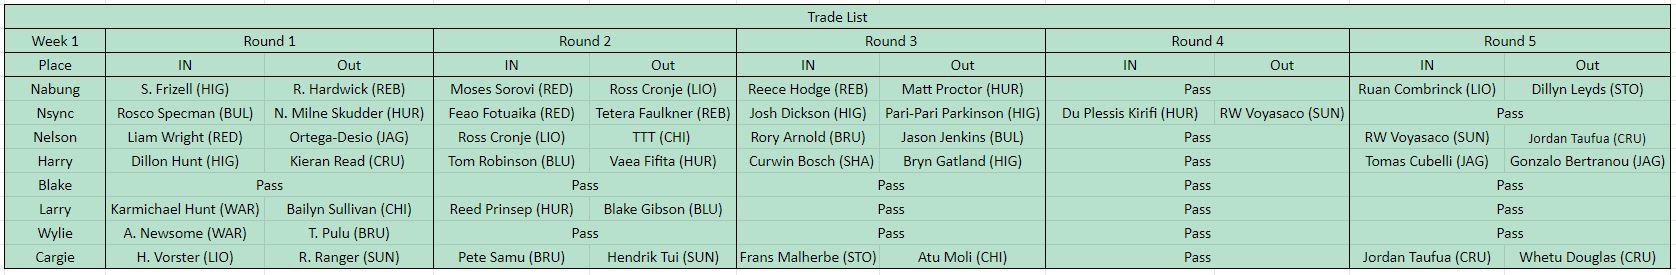 rd 1 trades